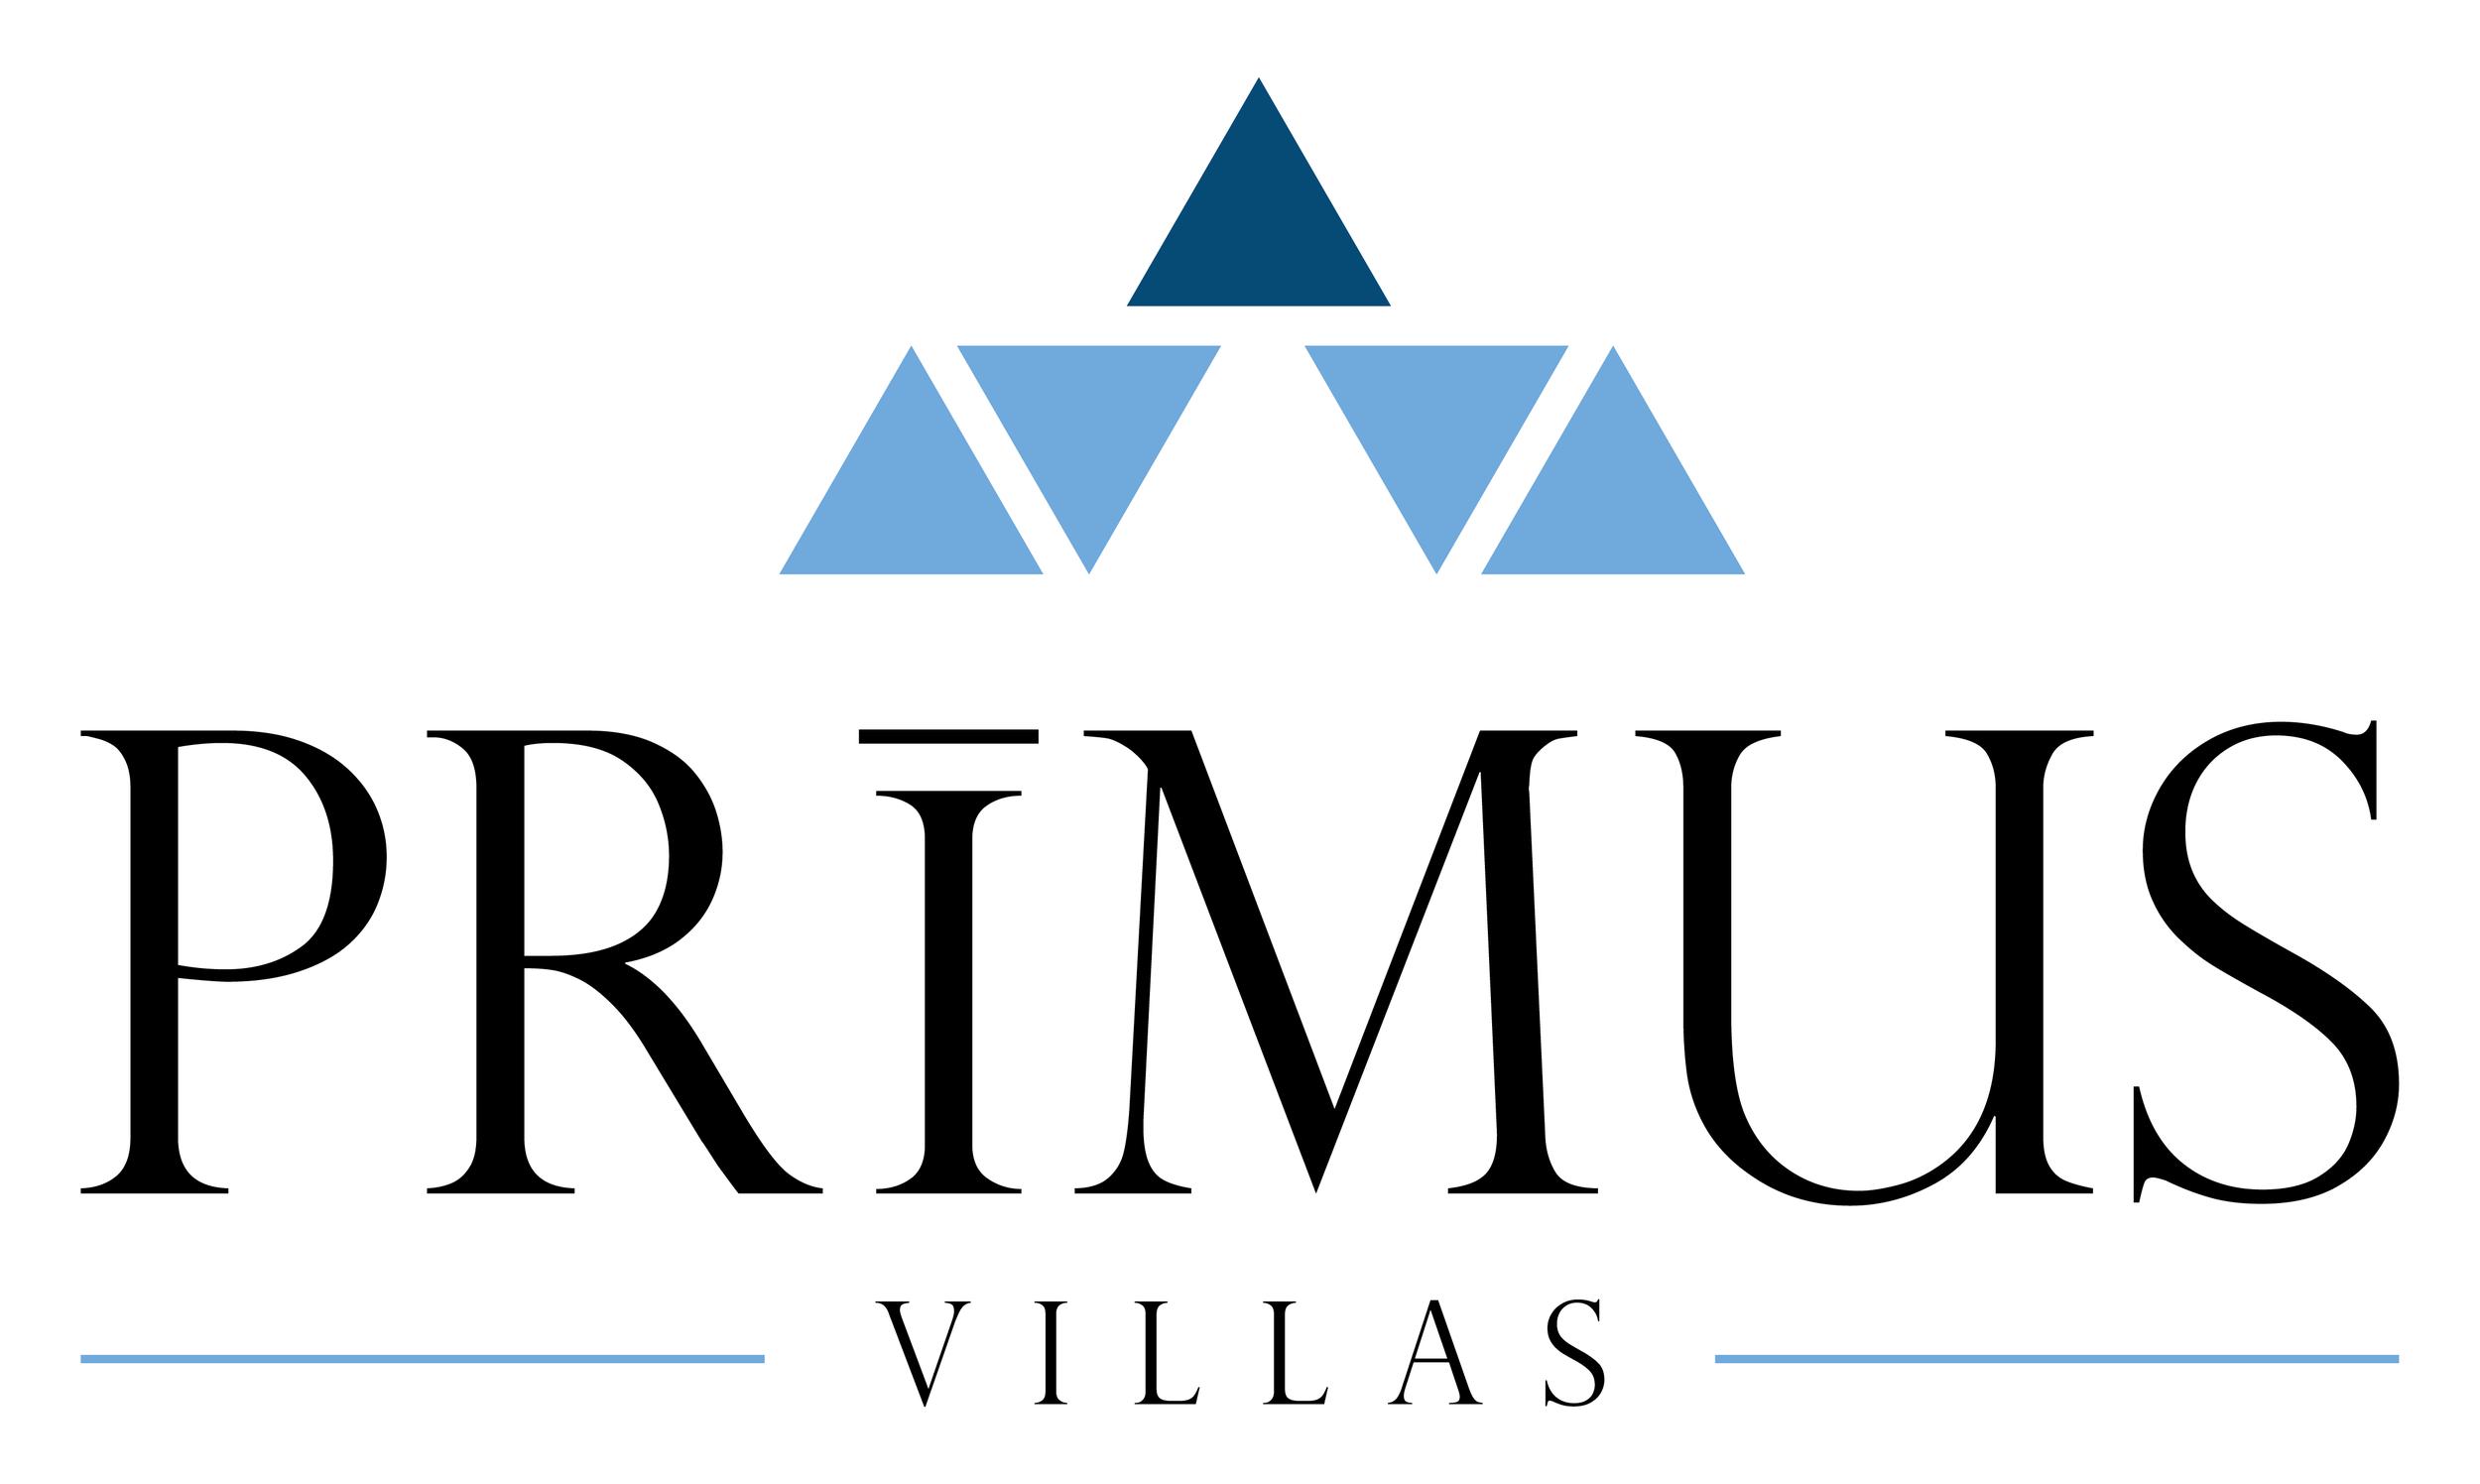 Primus-Villas-Full wo Tag-01.png